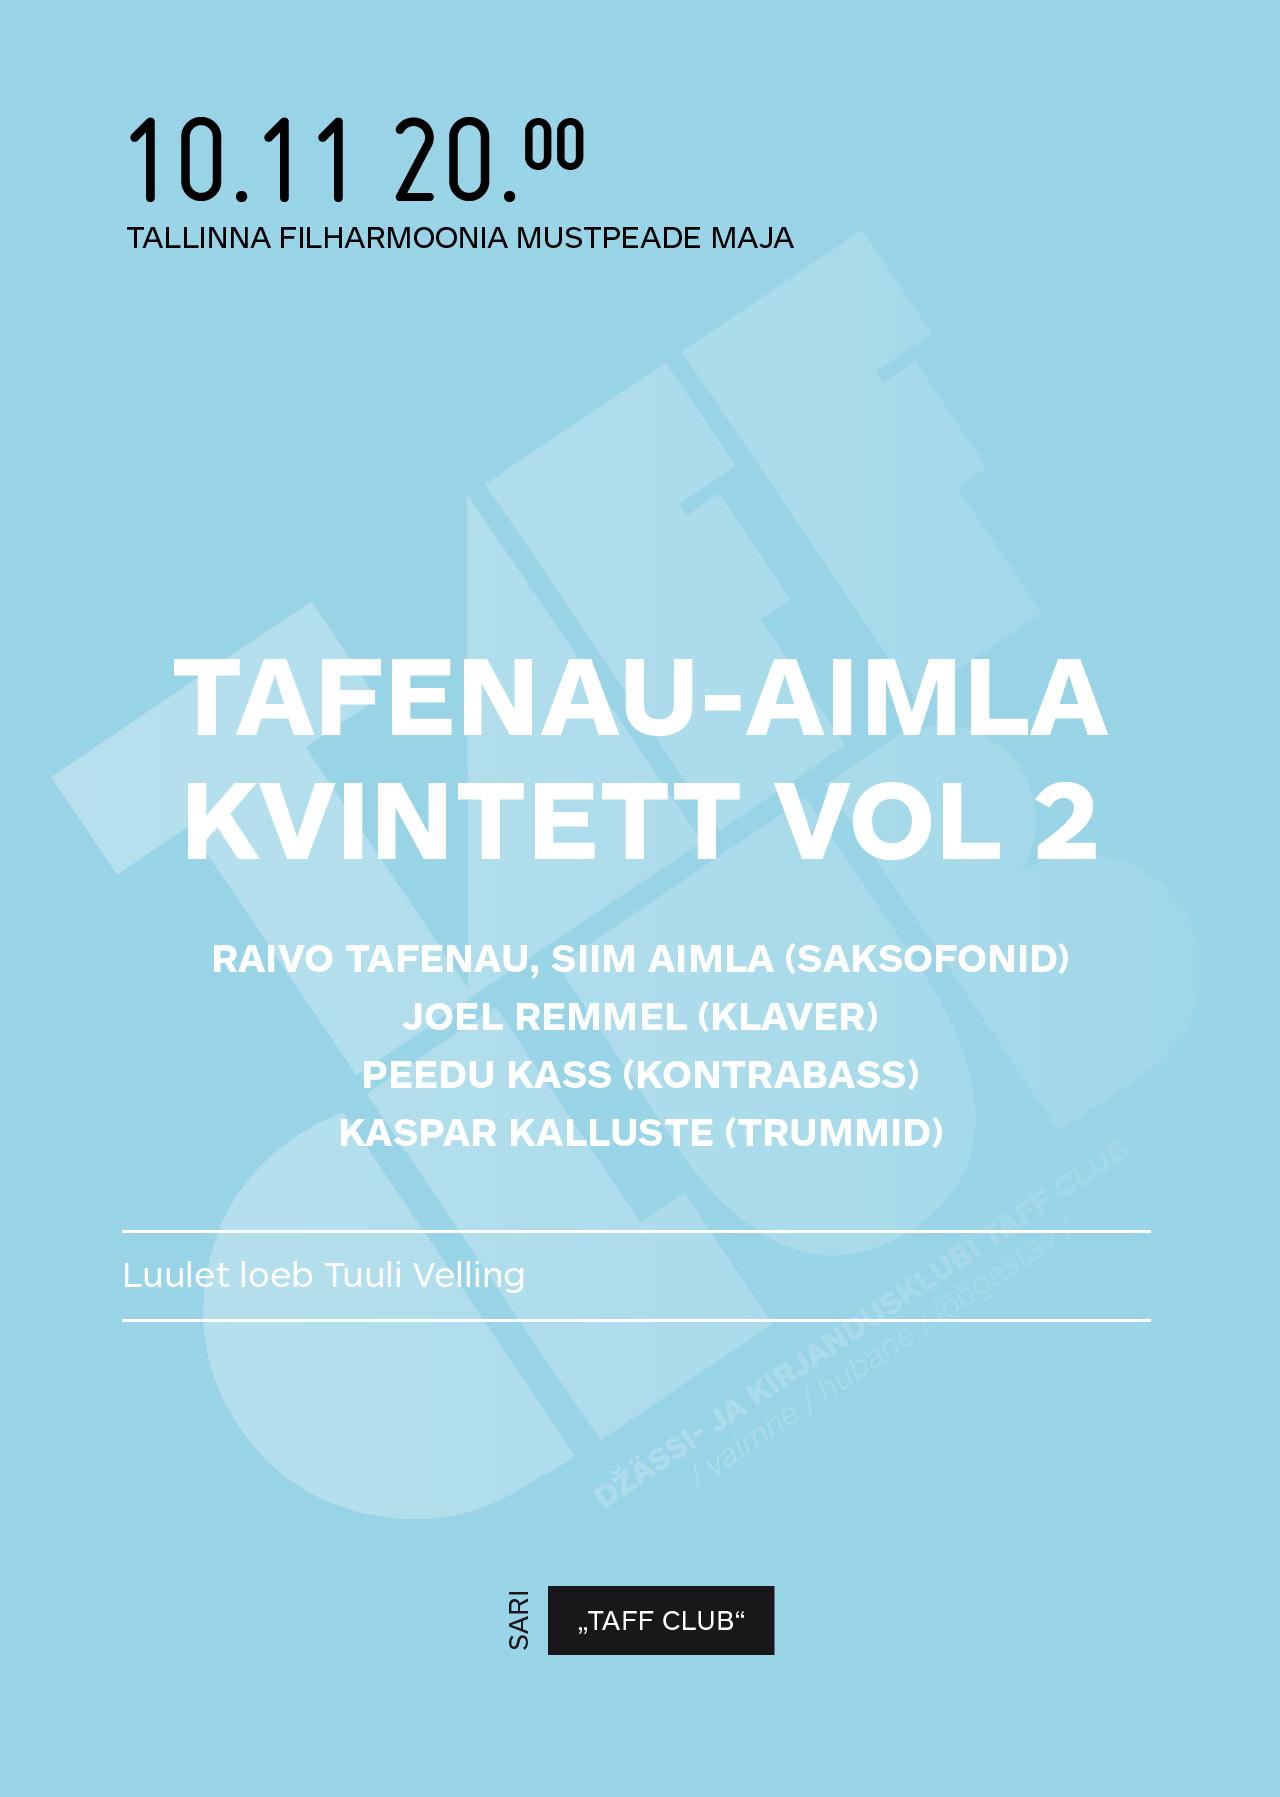 TAFF CLUB. TAFENAU-AIMLA KVINTETT VOL 2